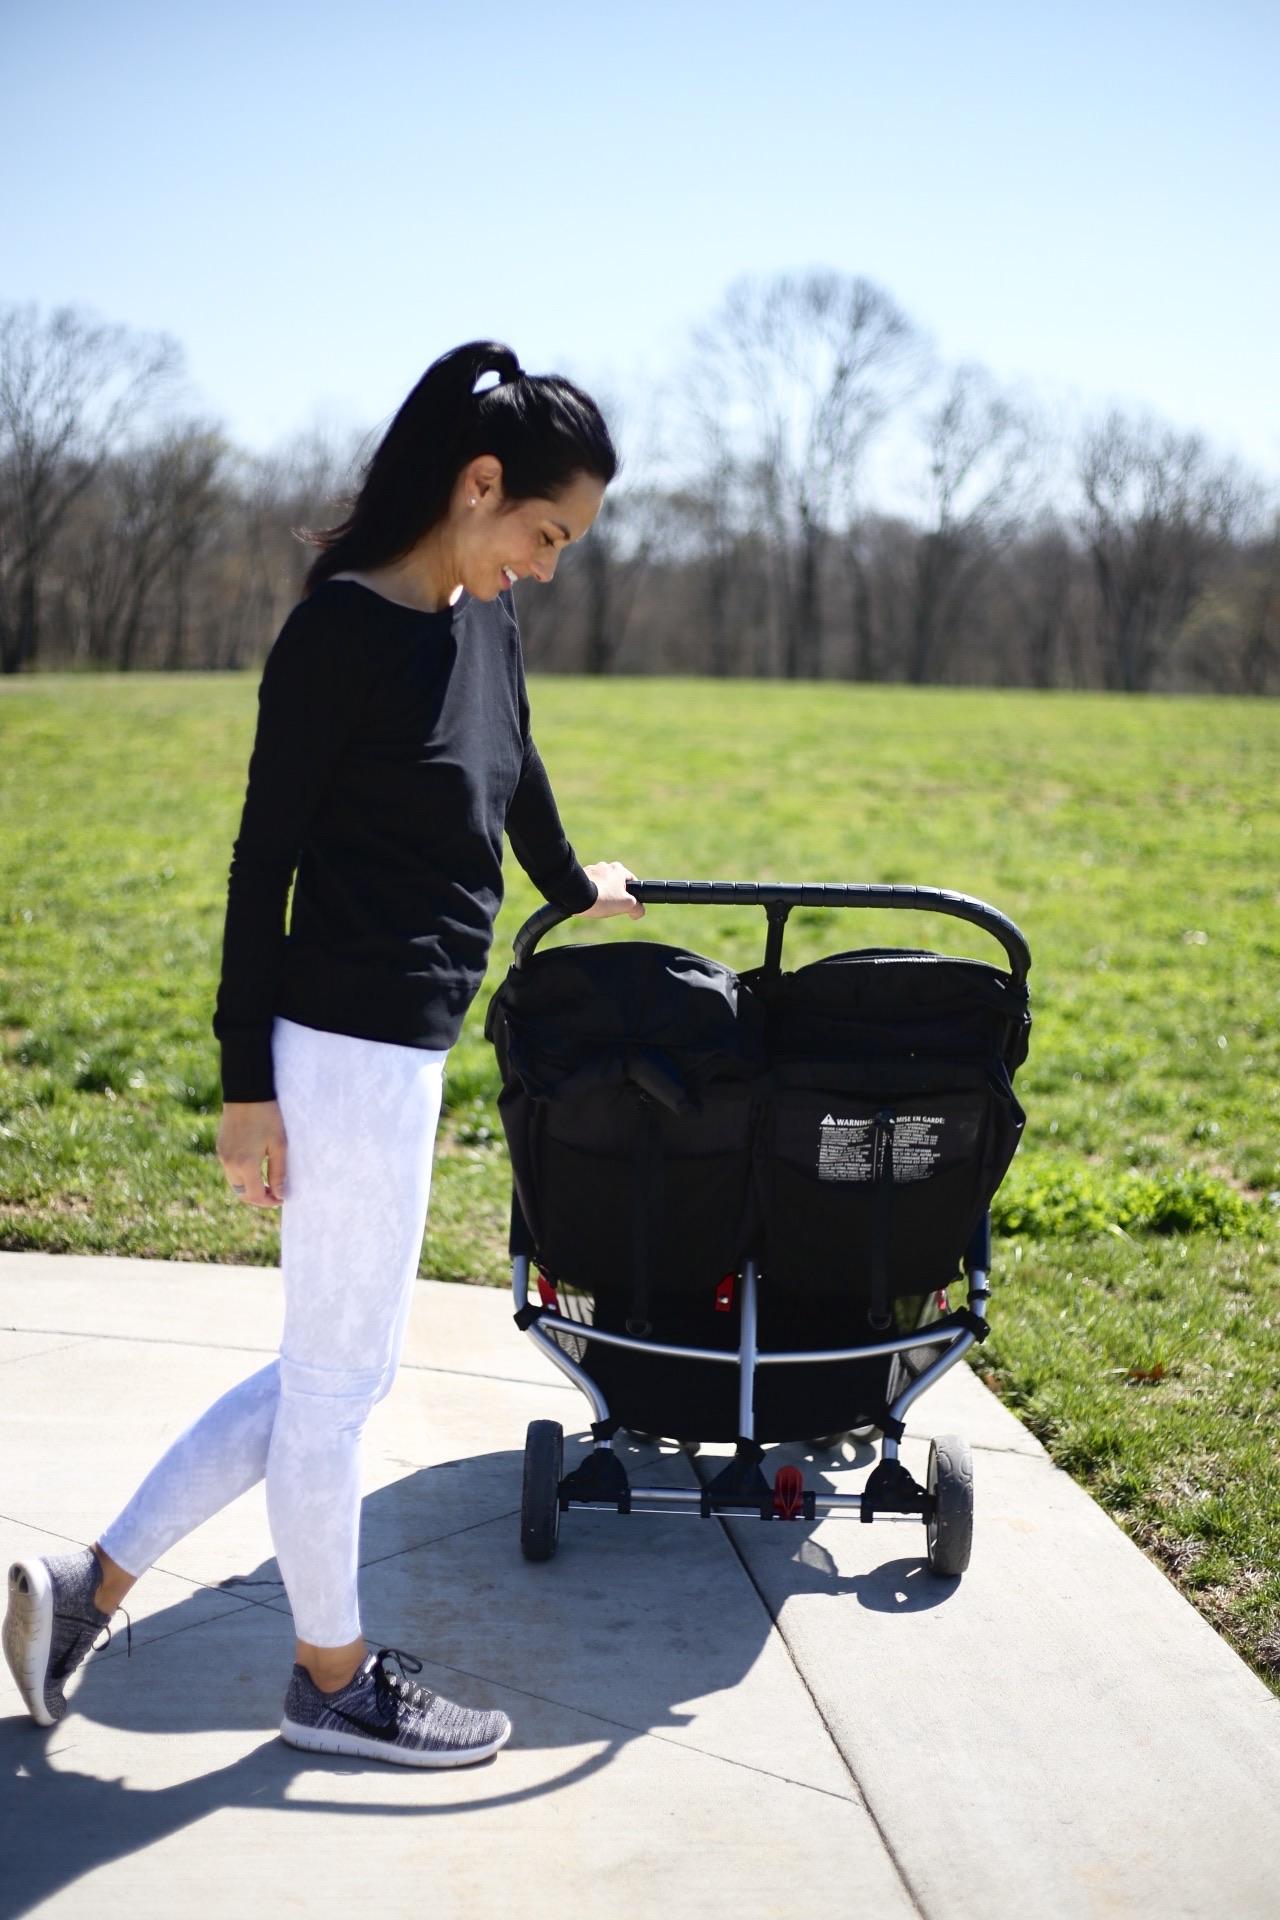 |  Alo leggings  |  Nike sneakers  | Zella top similar  |  double stroller  | image: Sydney Clawson |